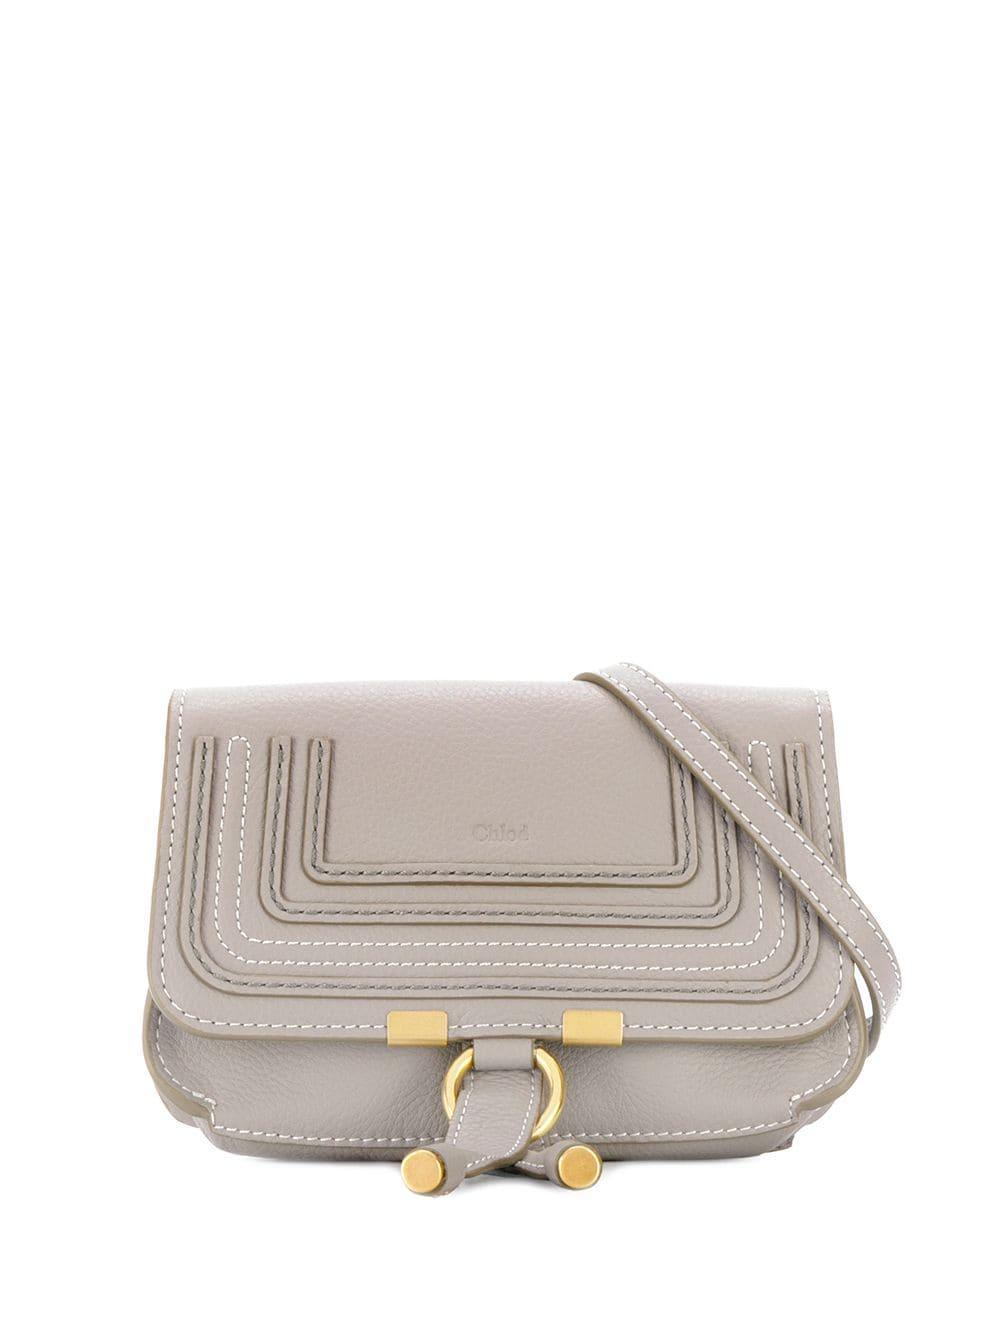 Marcie Small Belt Bag Item # CHC19AS179161053